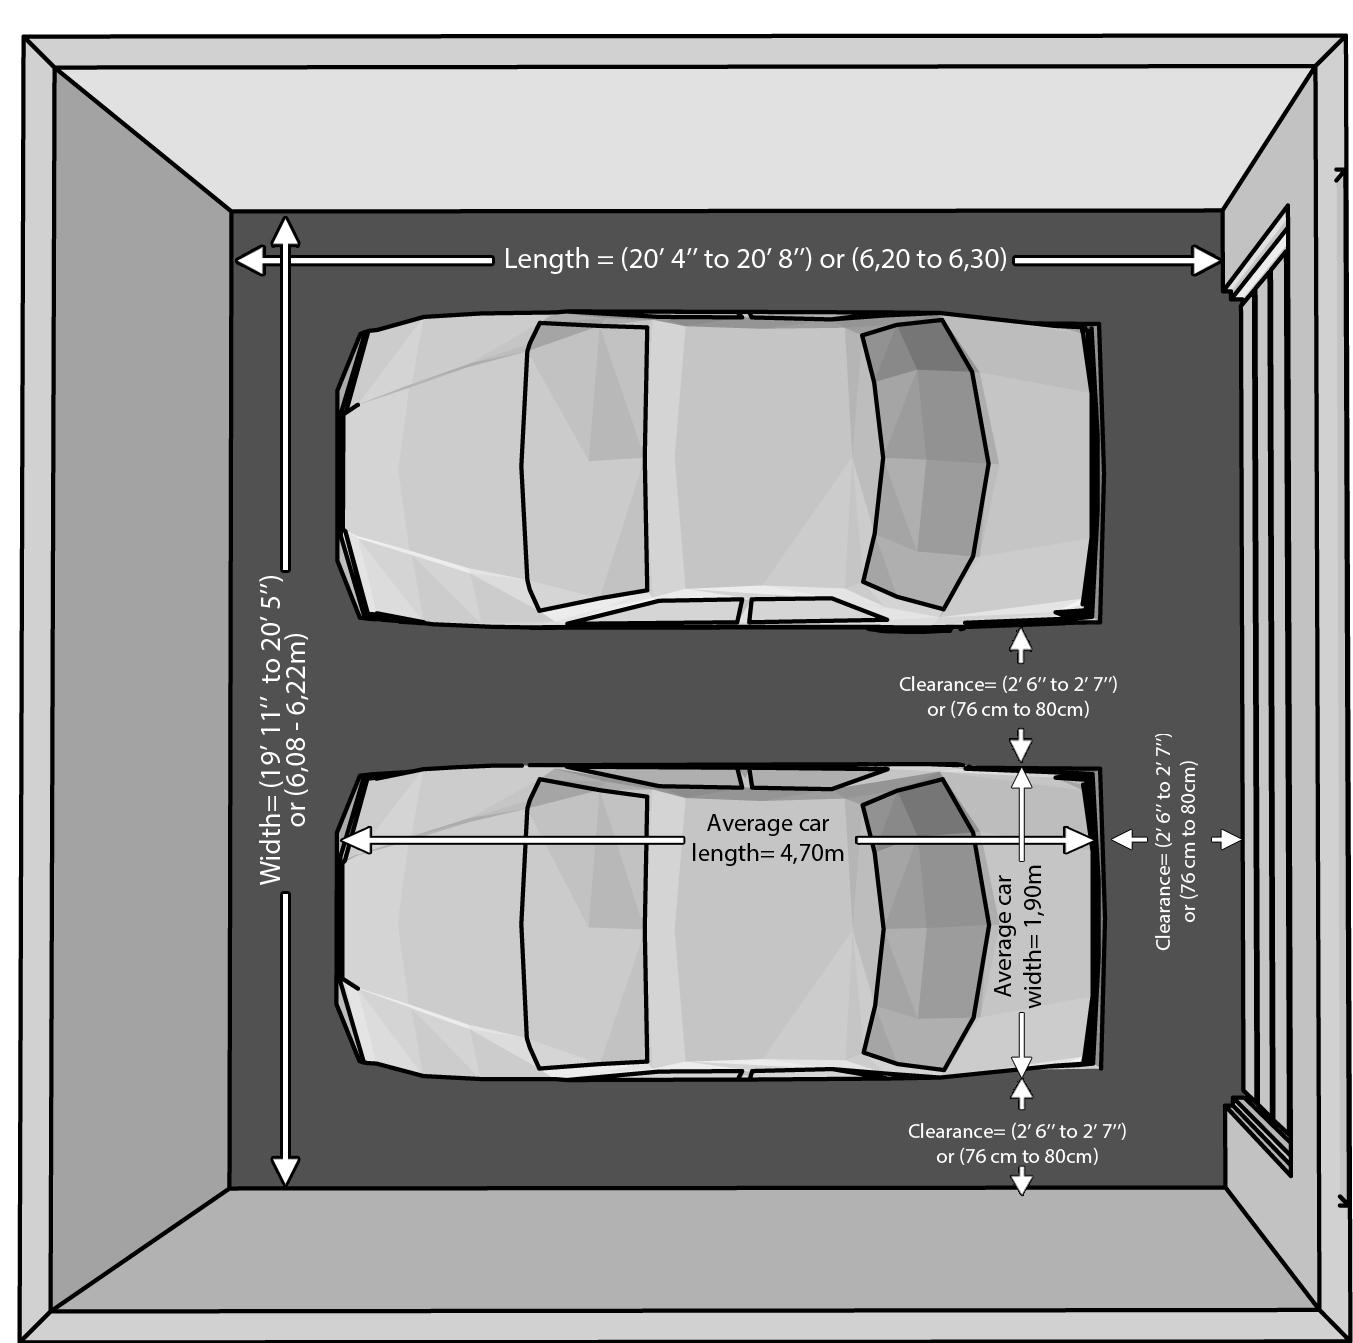 Ukuran Minimal Garasi Mobil - Rumah Sae